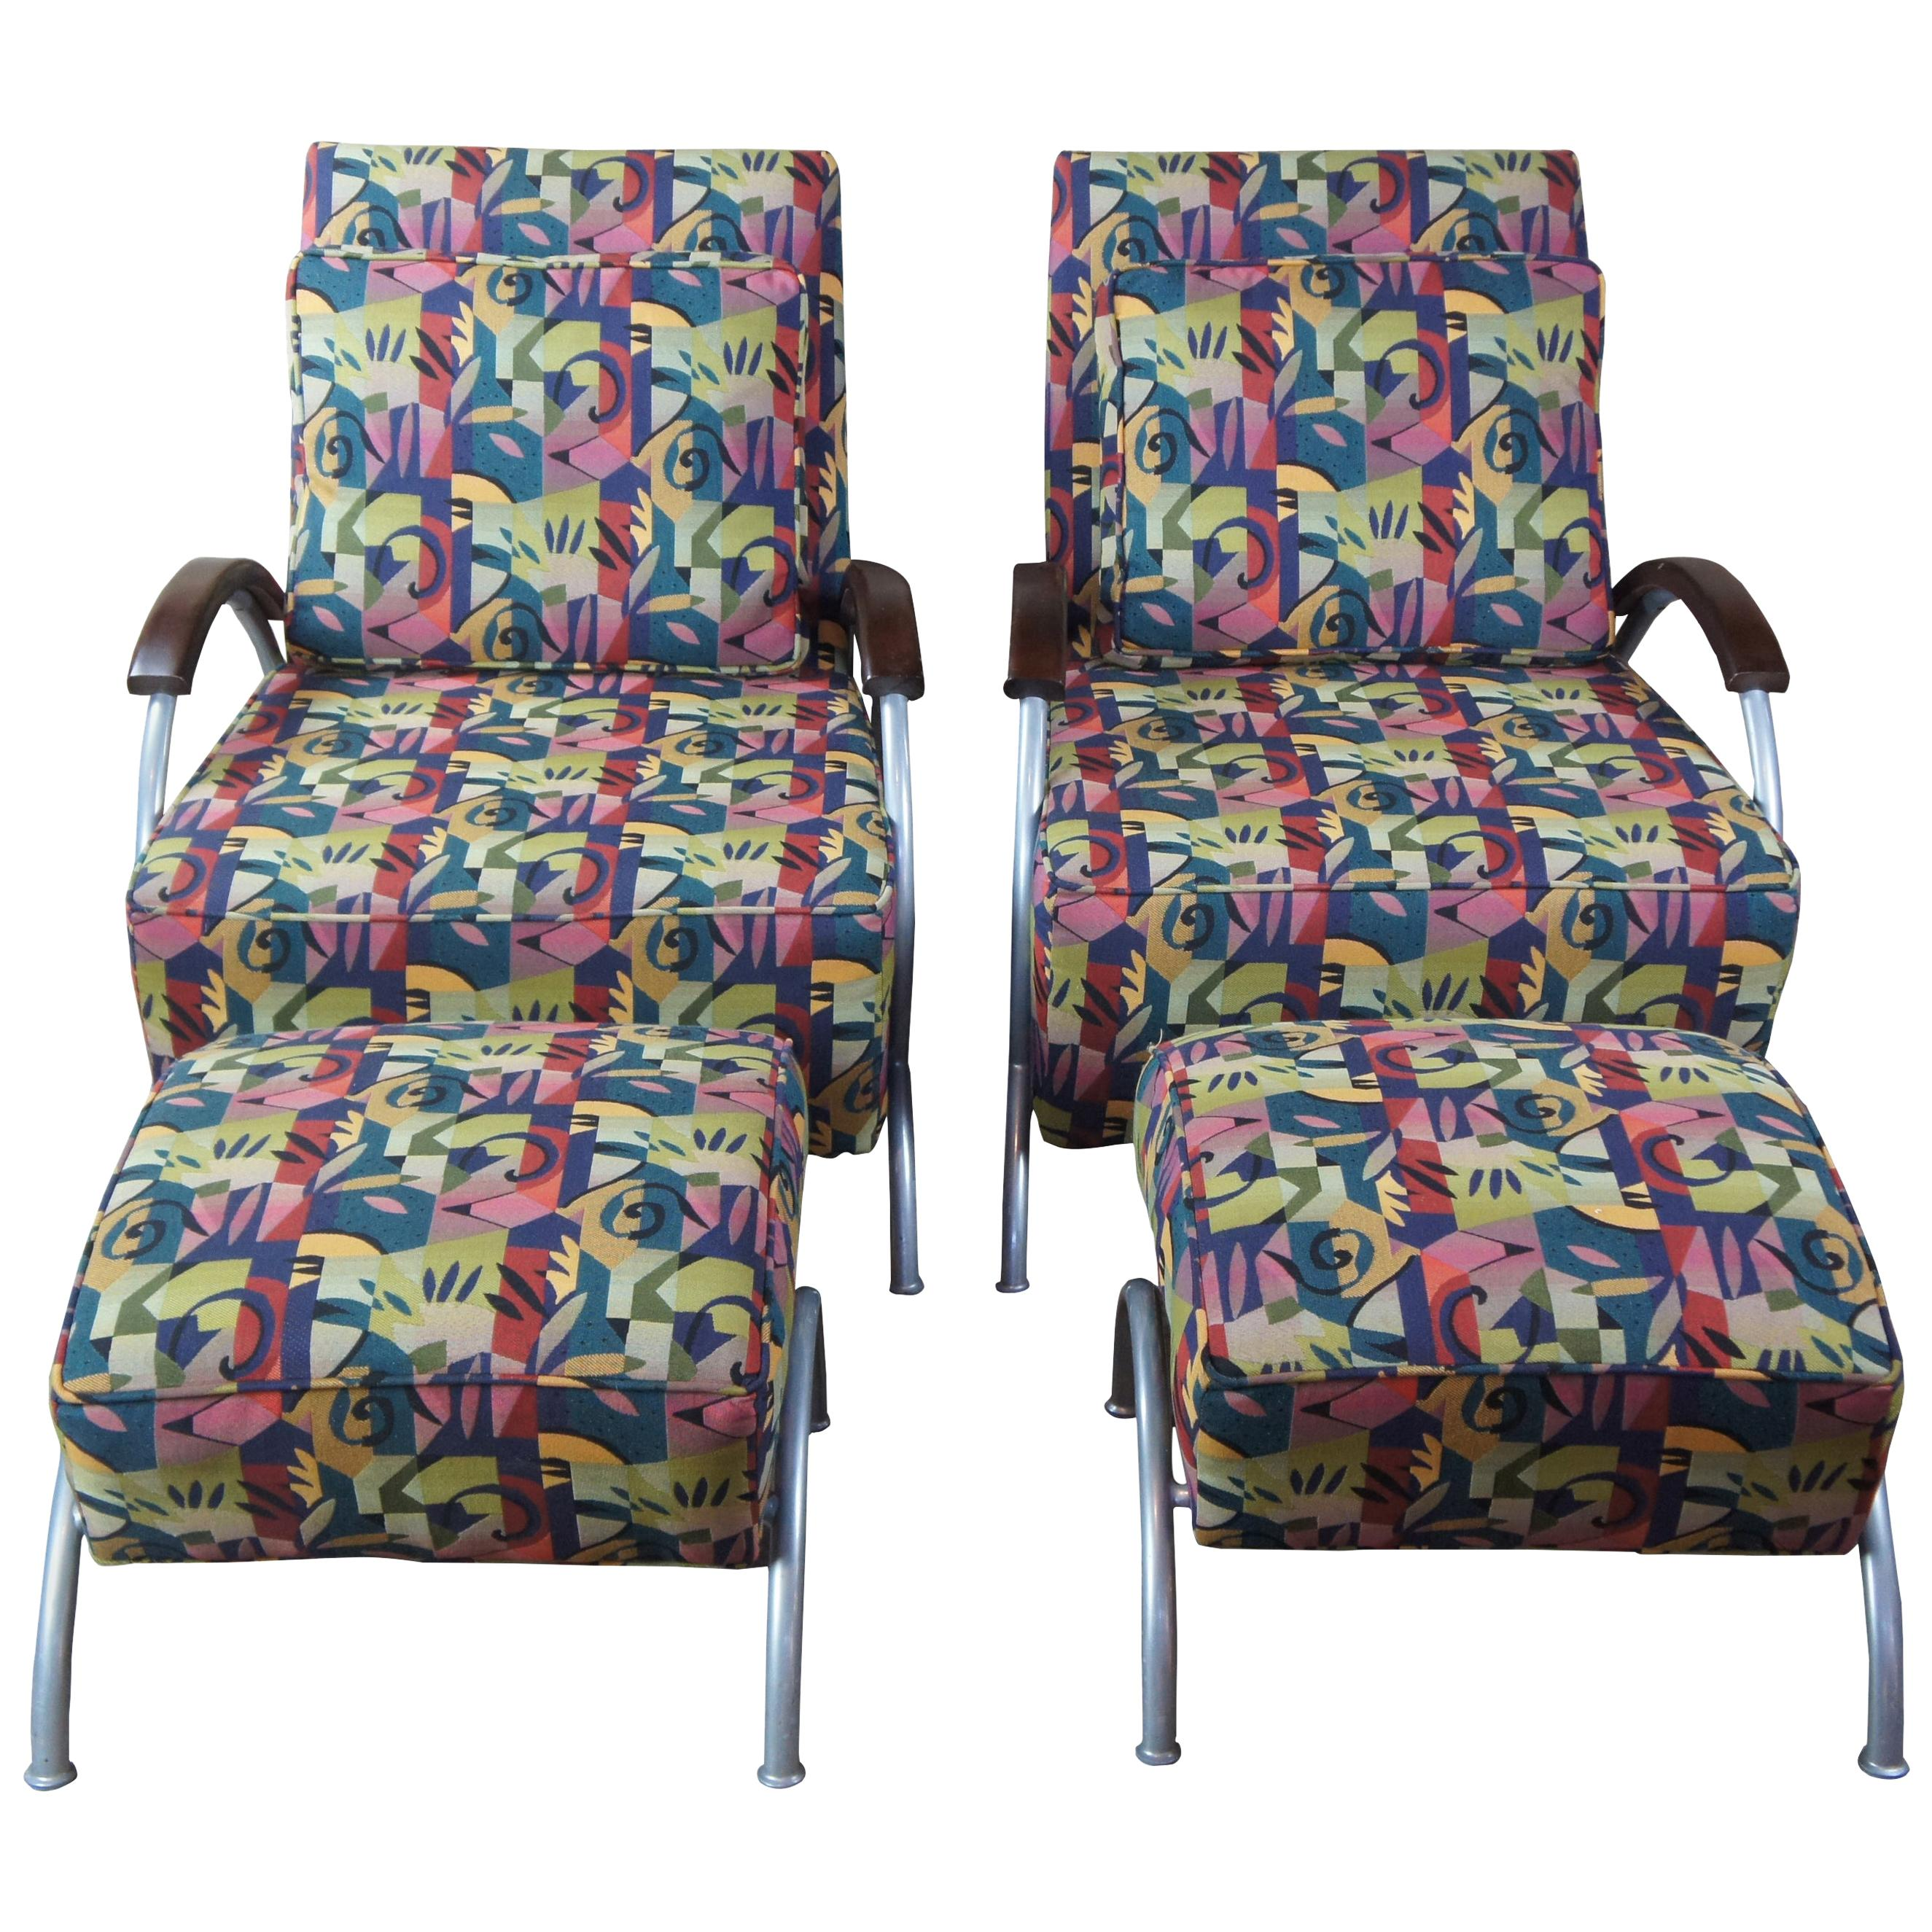 Milo Baughman for Thayer Coggin Mid-Century Modern Lounge Chairs Ottomans